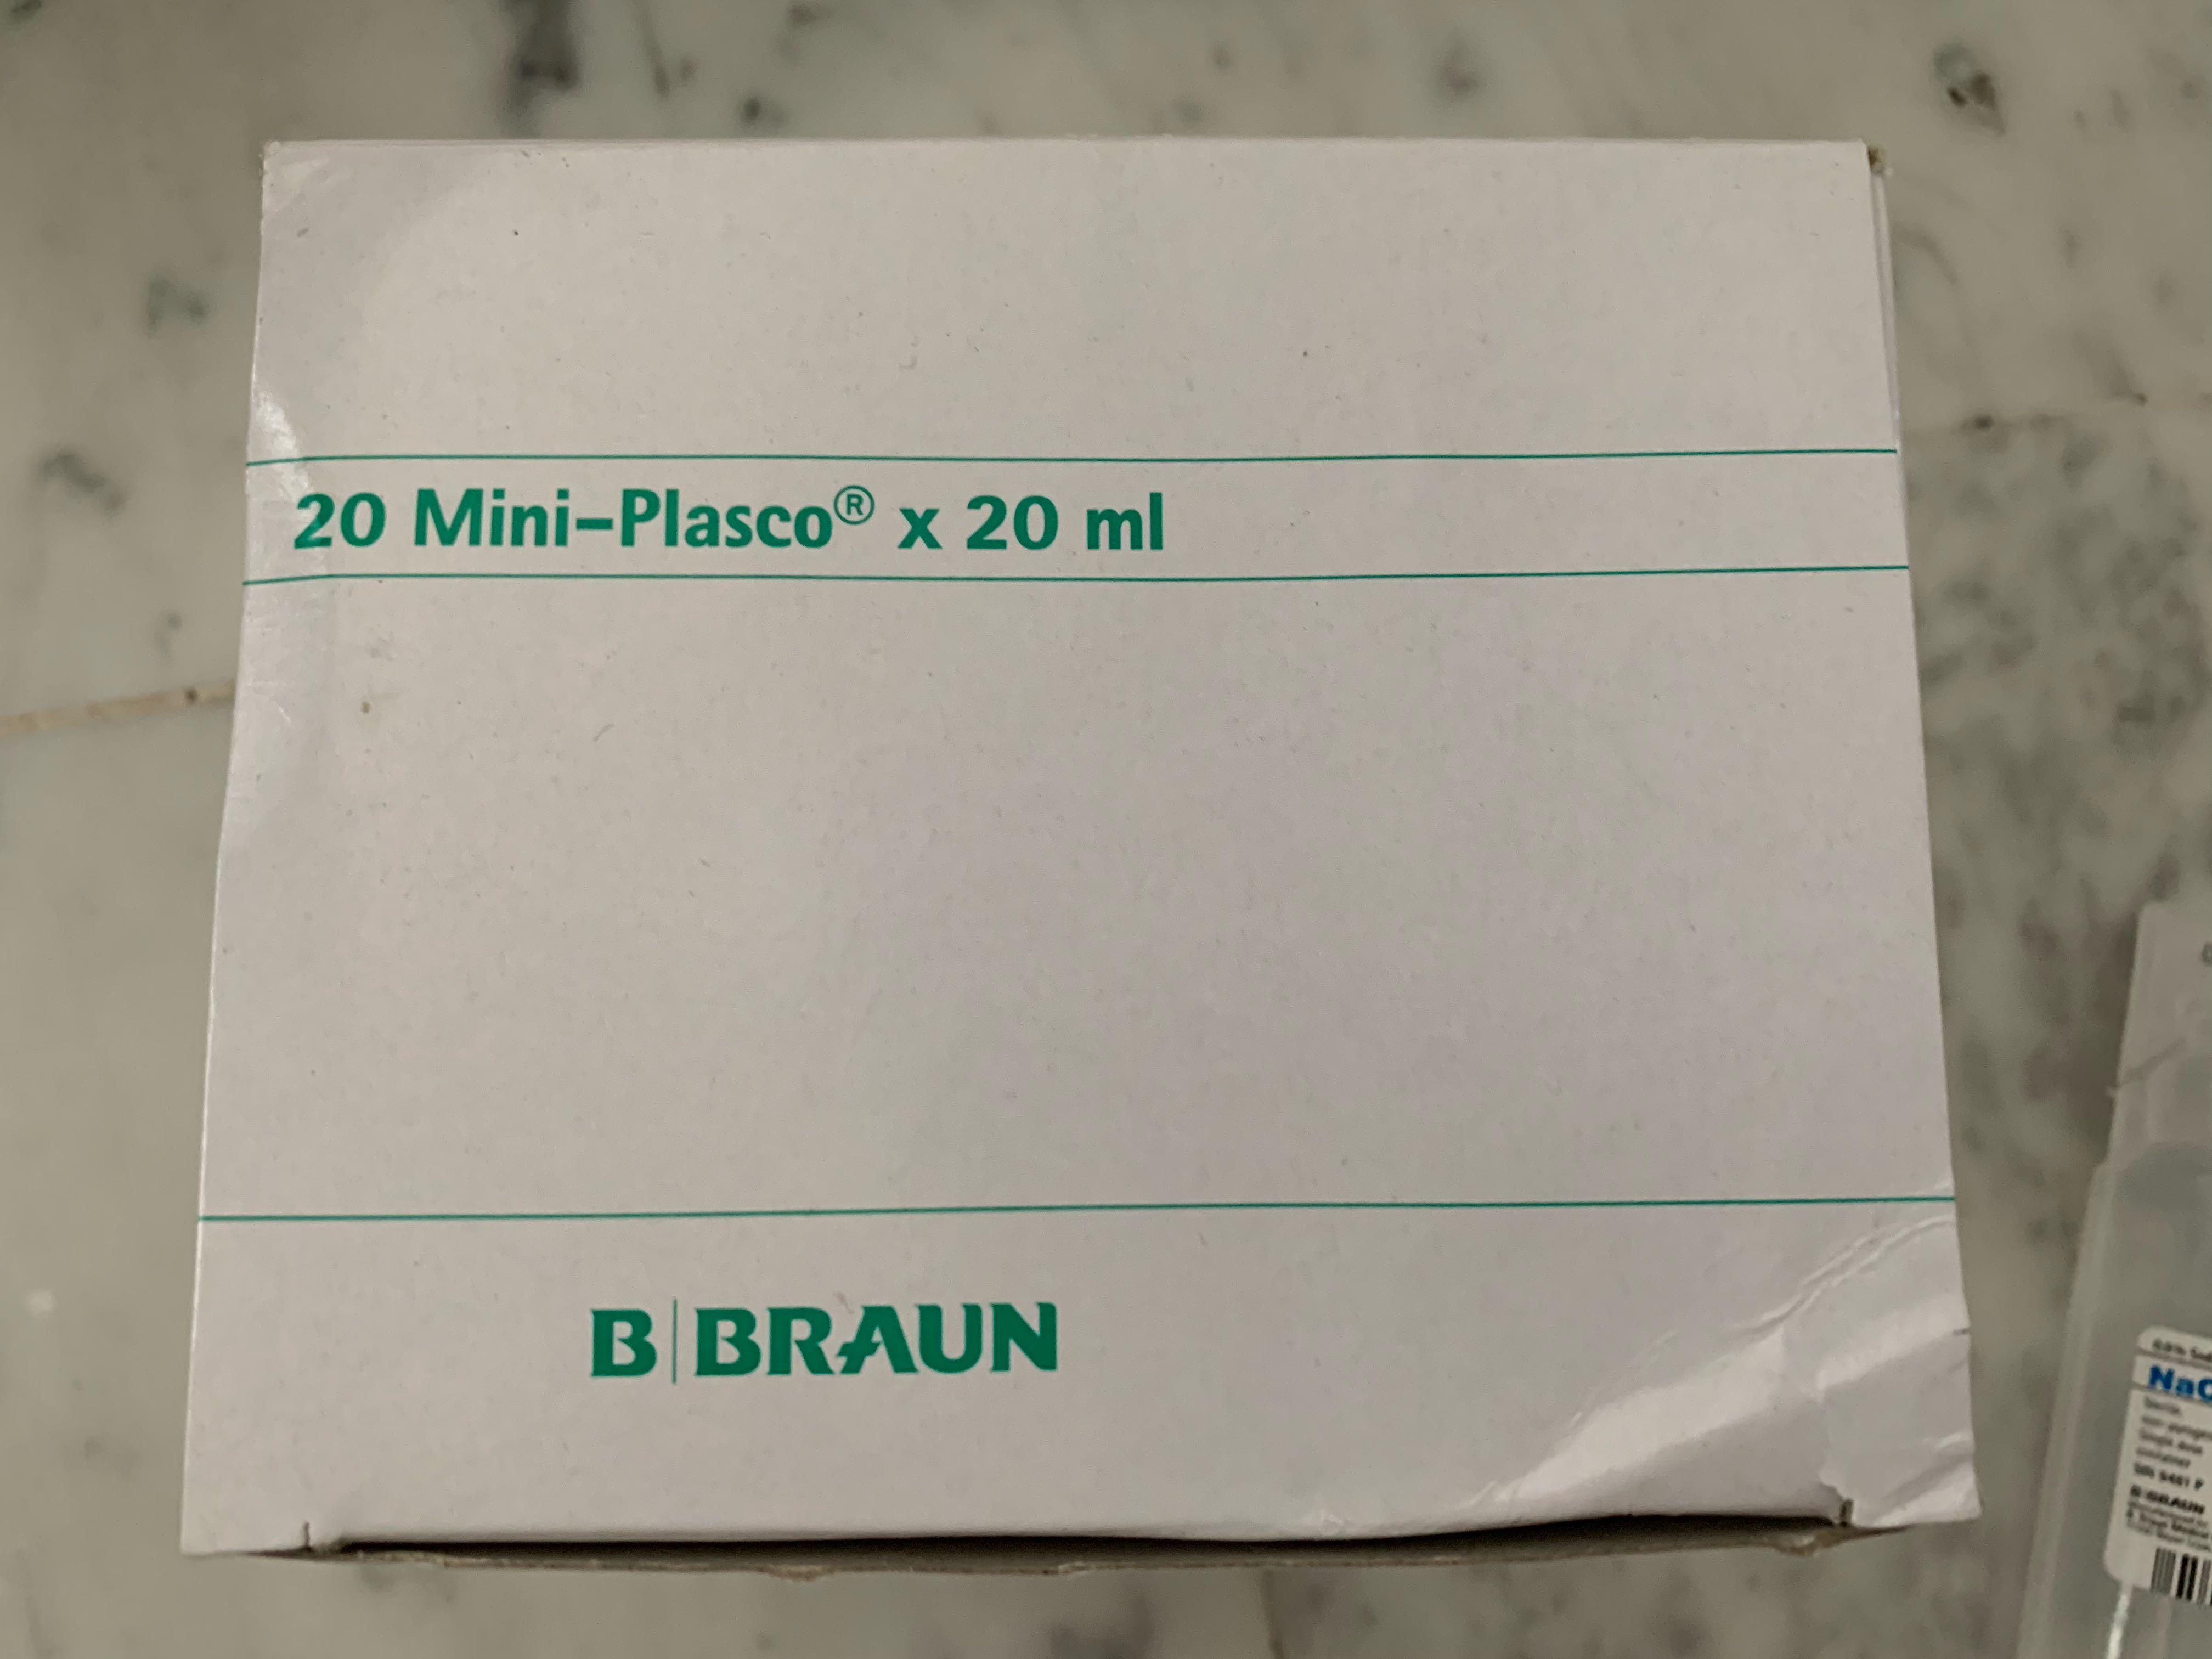 0.9% Sodium chloride (NaCl 0.9%) b.Braun